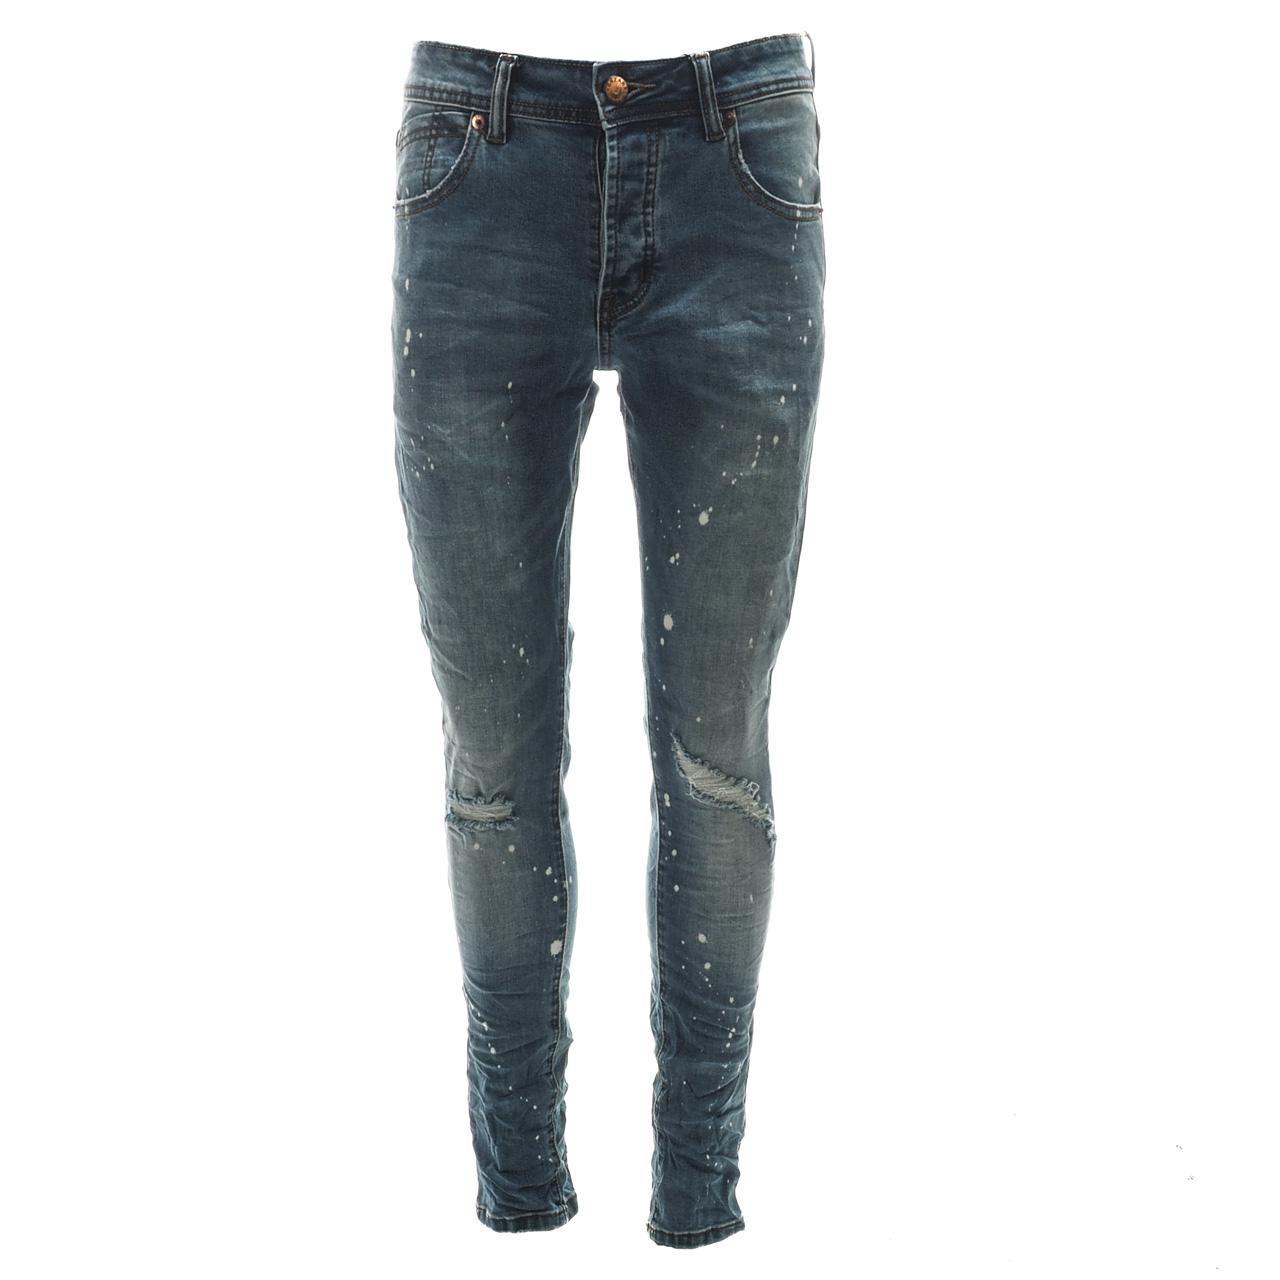 Jeans-Pants-Senders-Rikavik-Used-Blue-Blue-50030-New